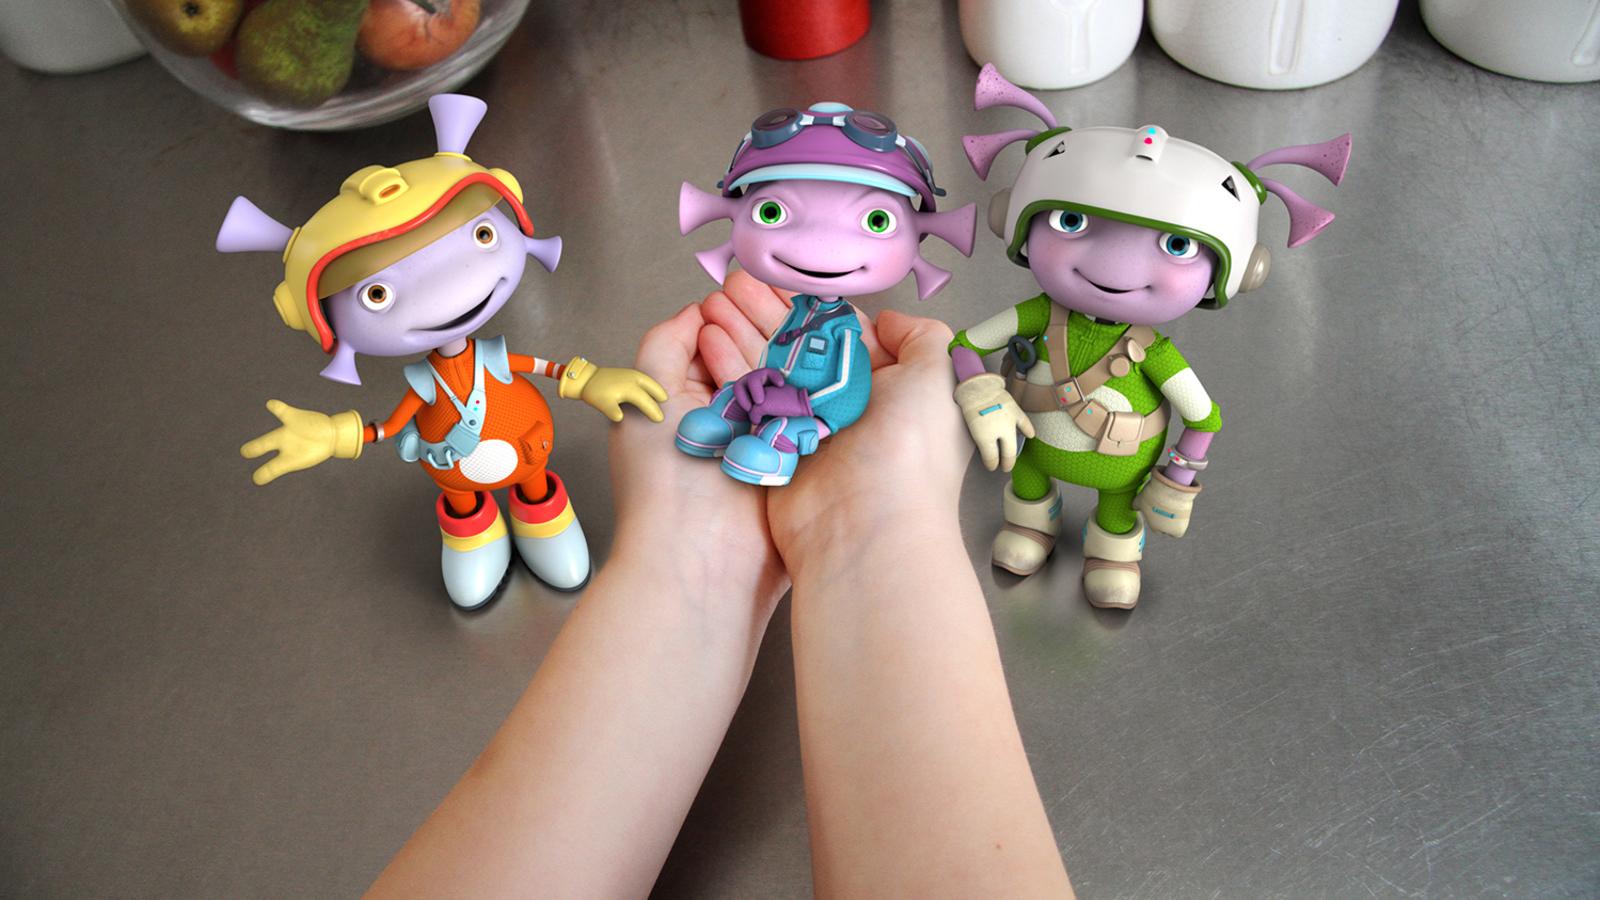 Floogals composited into kitchen scene